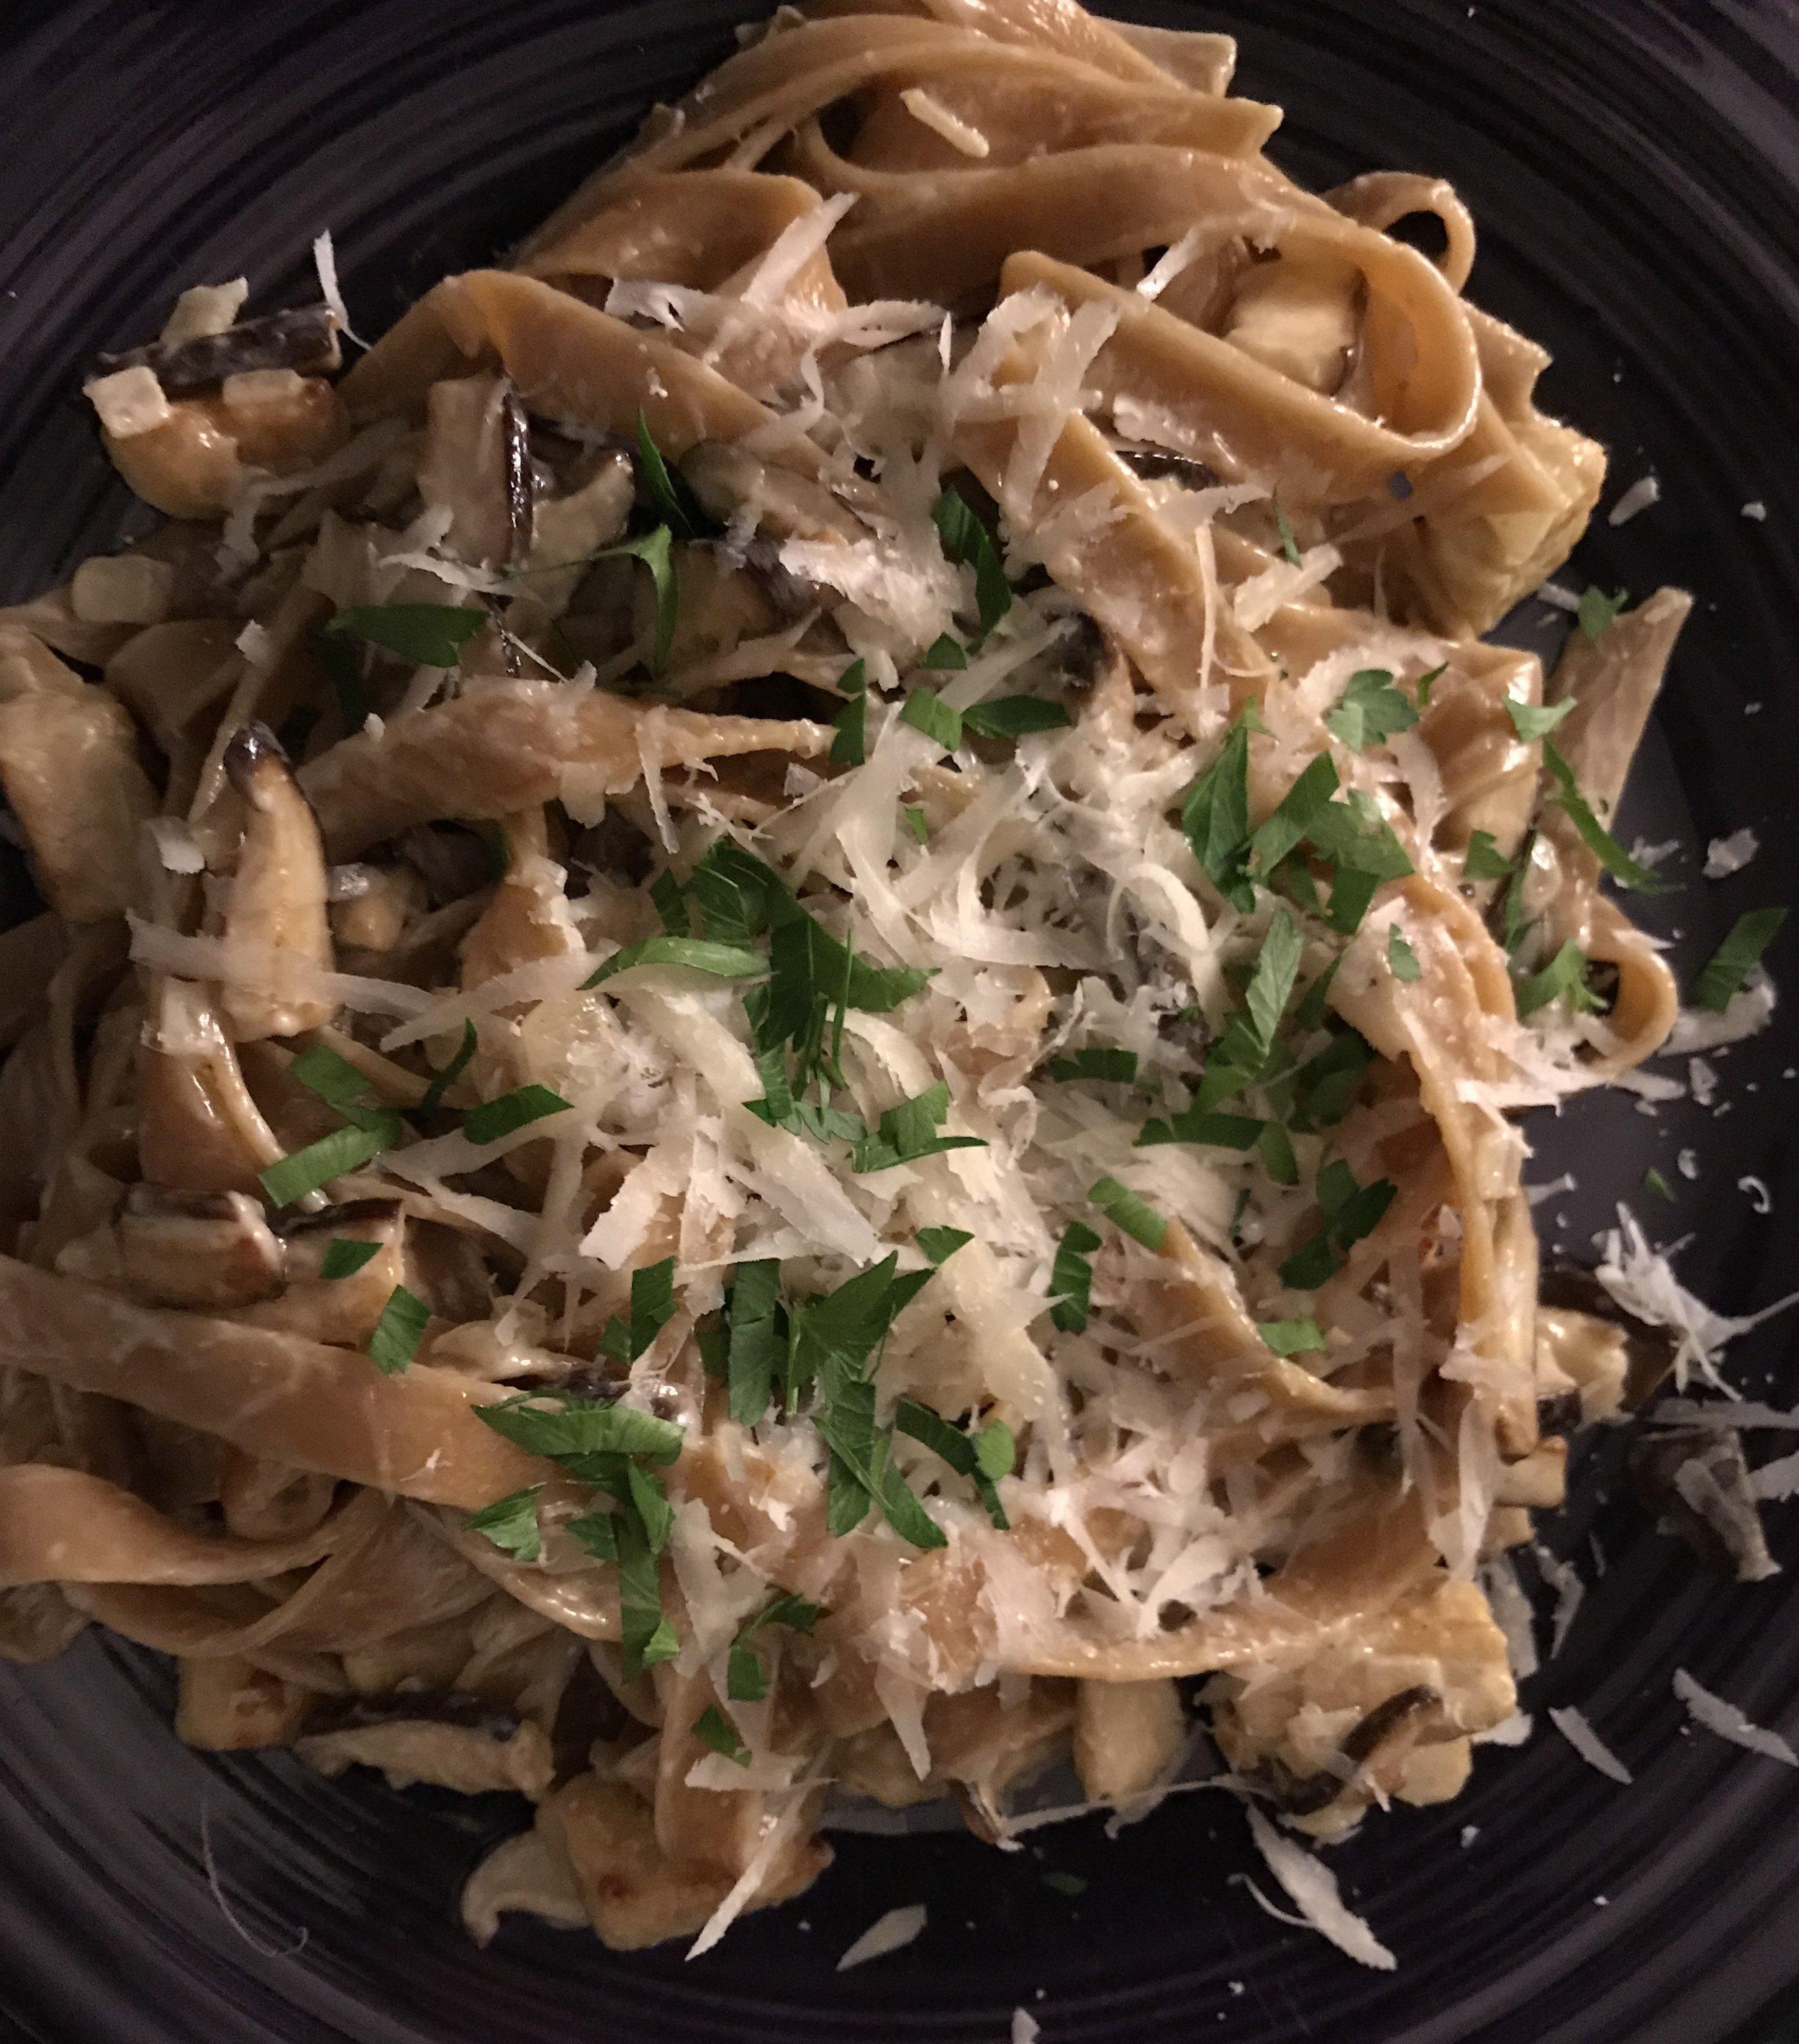 Porcini Linguine - with Shiitake Mushrooms & Gorgonzola Sauce(Also I am not a talented food photographer)